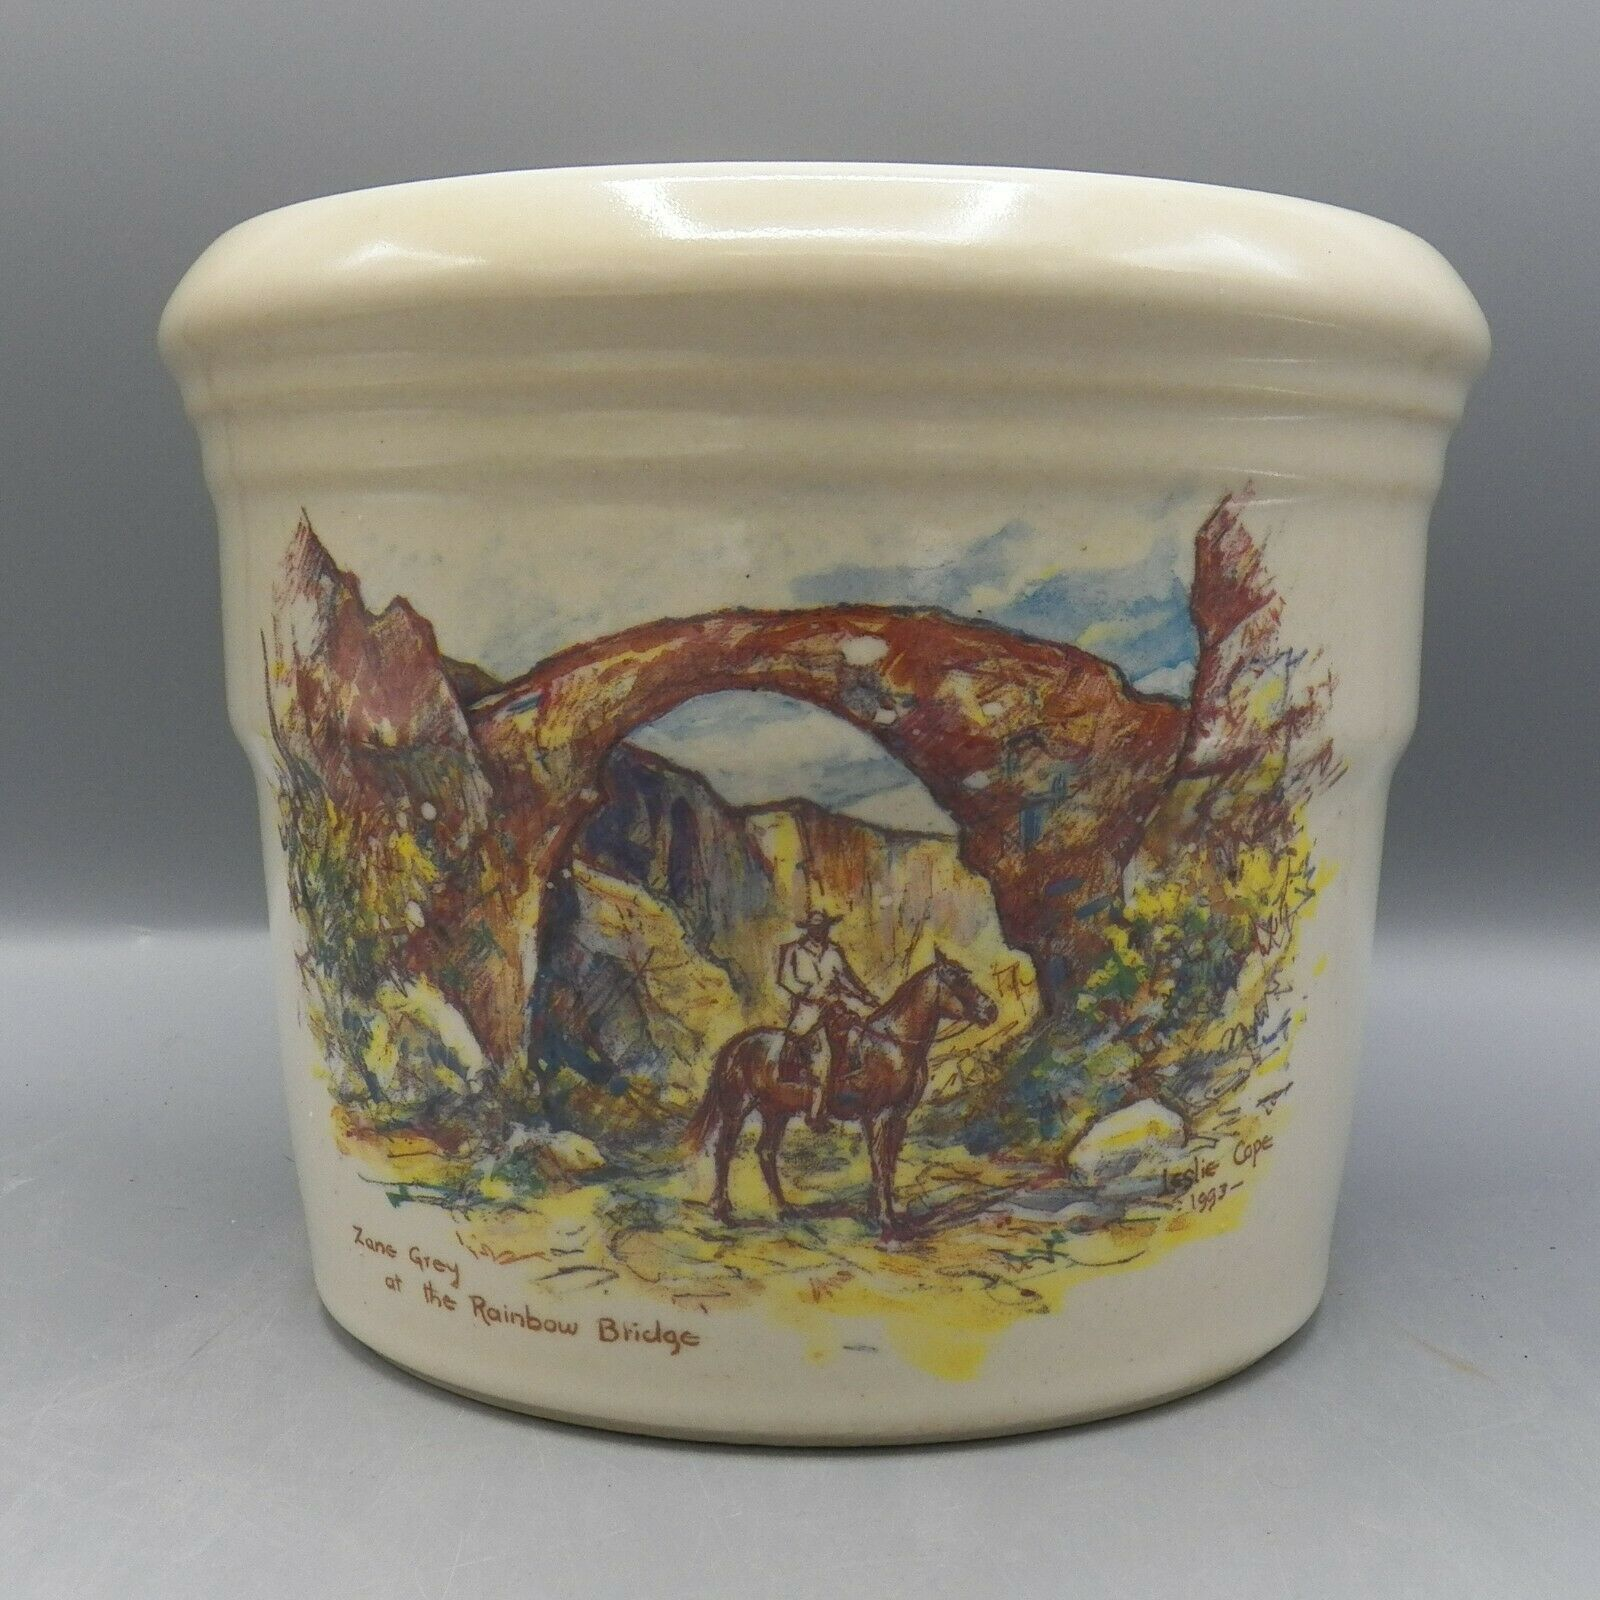 Zanesville Stoneware Zane Grey At Rainbow Bridge Leslie Cope Vase Pot Pottery image 11